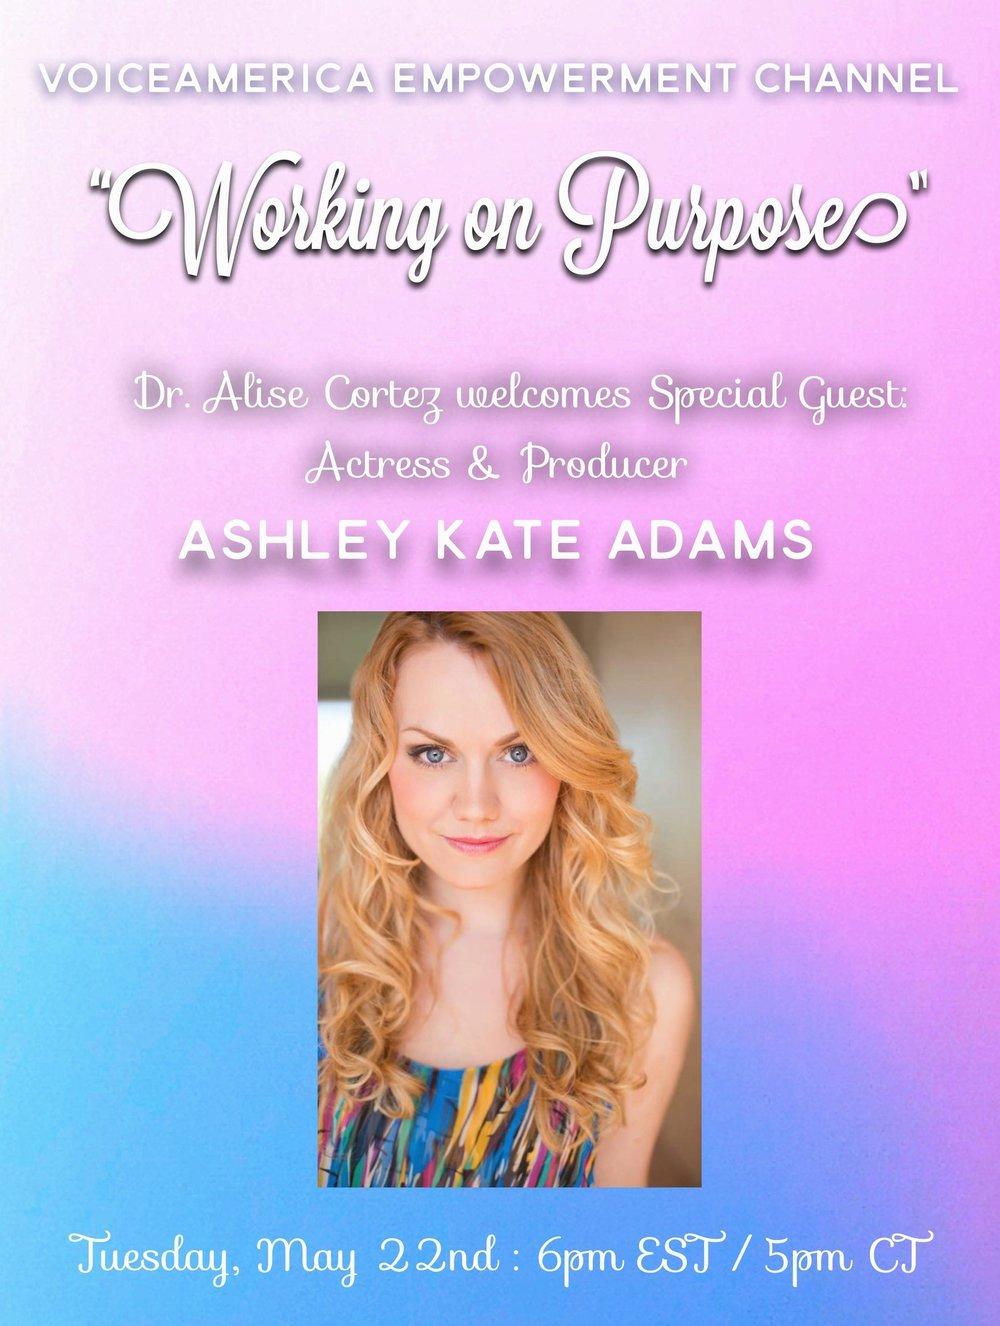 Ashley Adams Wikipedia ashley kate adams